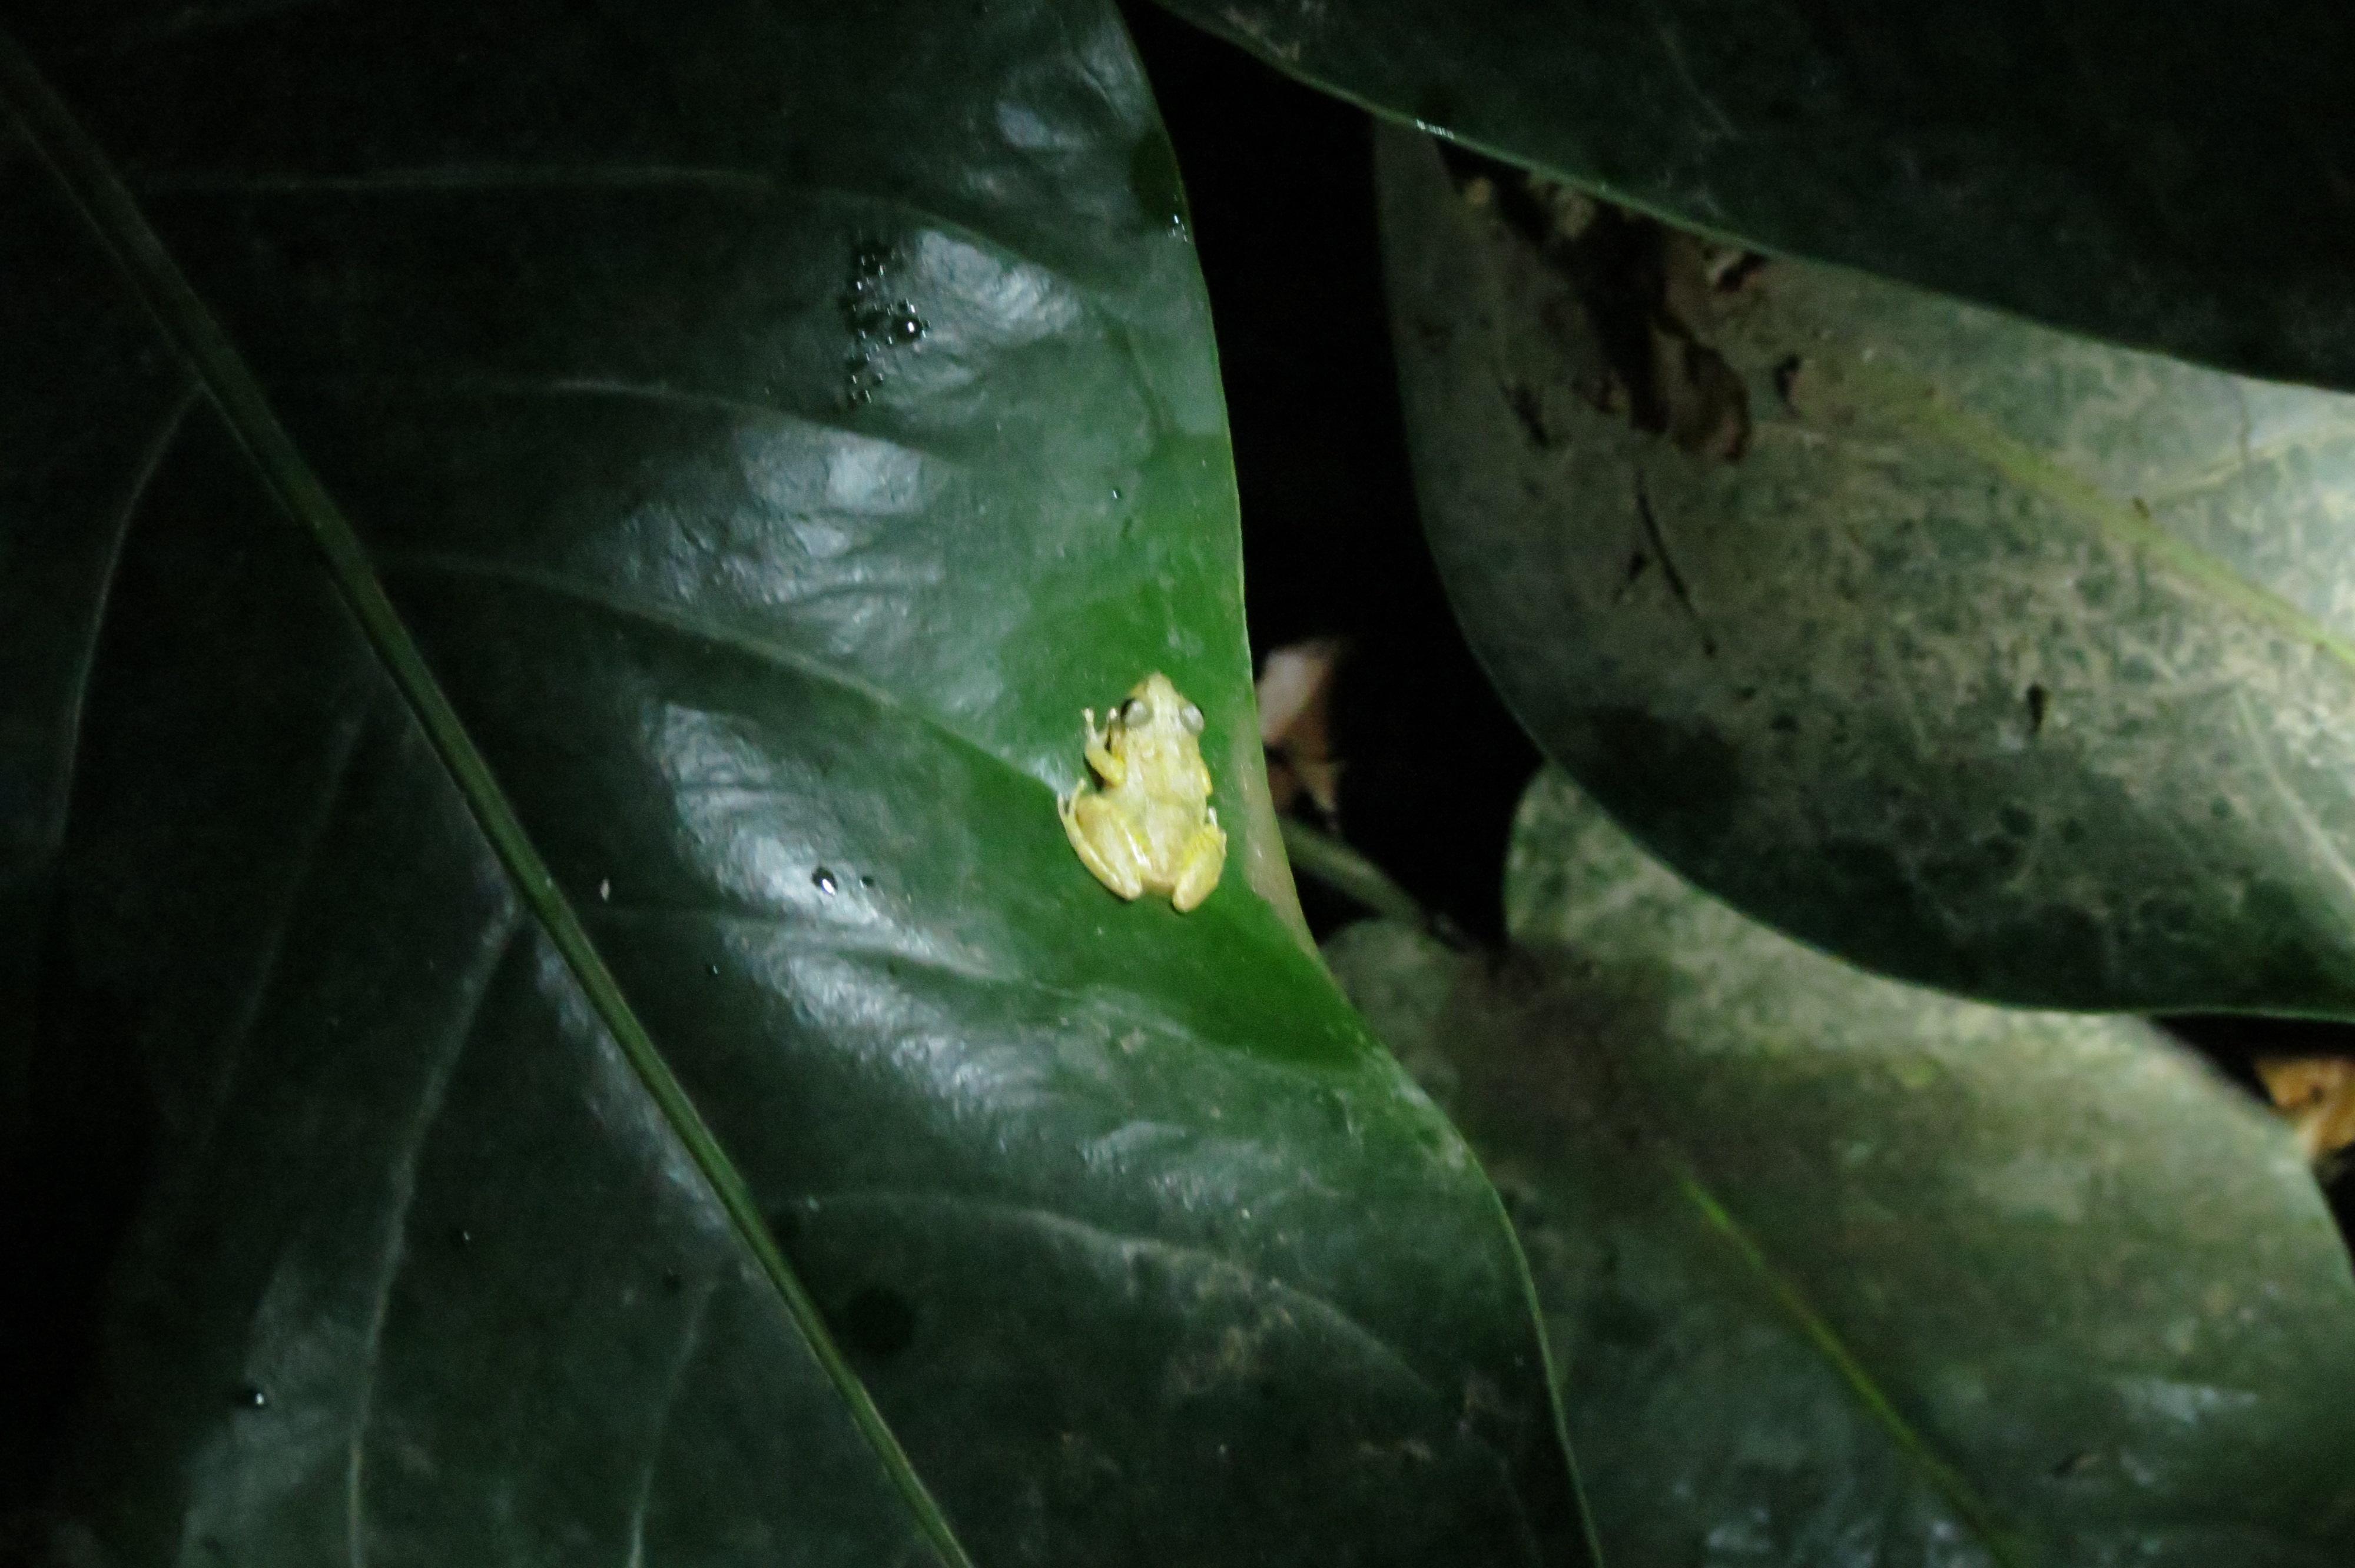 צפרדע בסיור לילי בג'ונגל